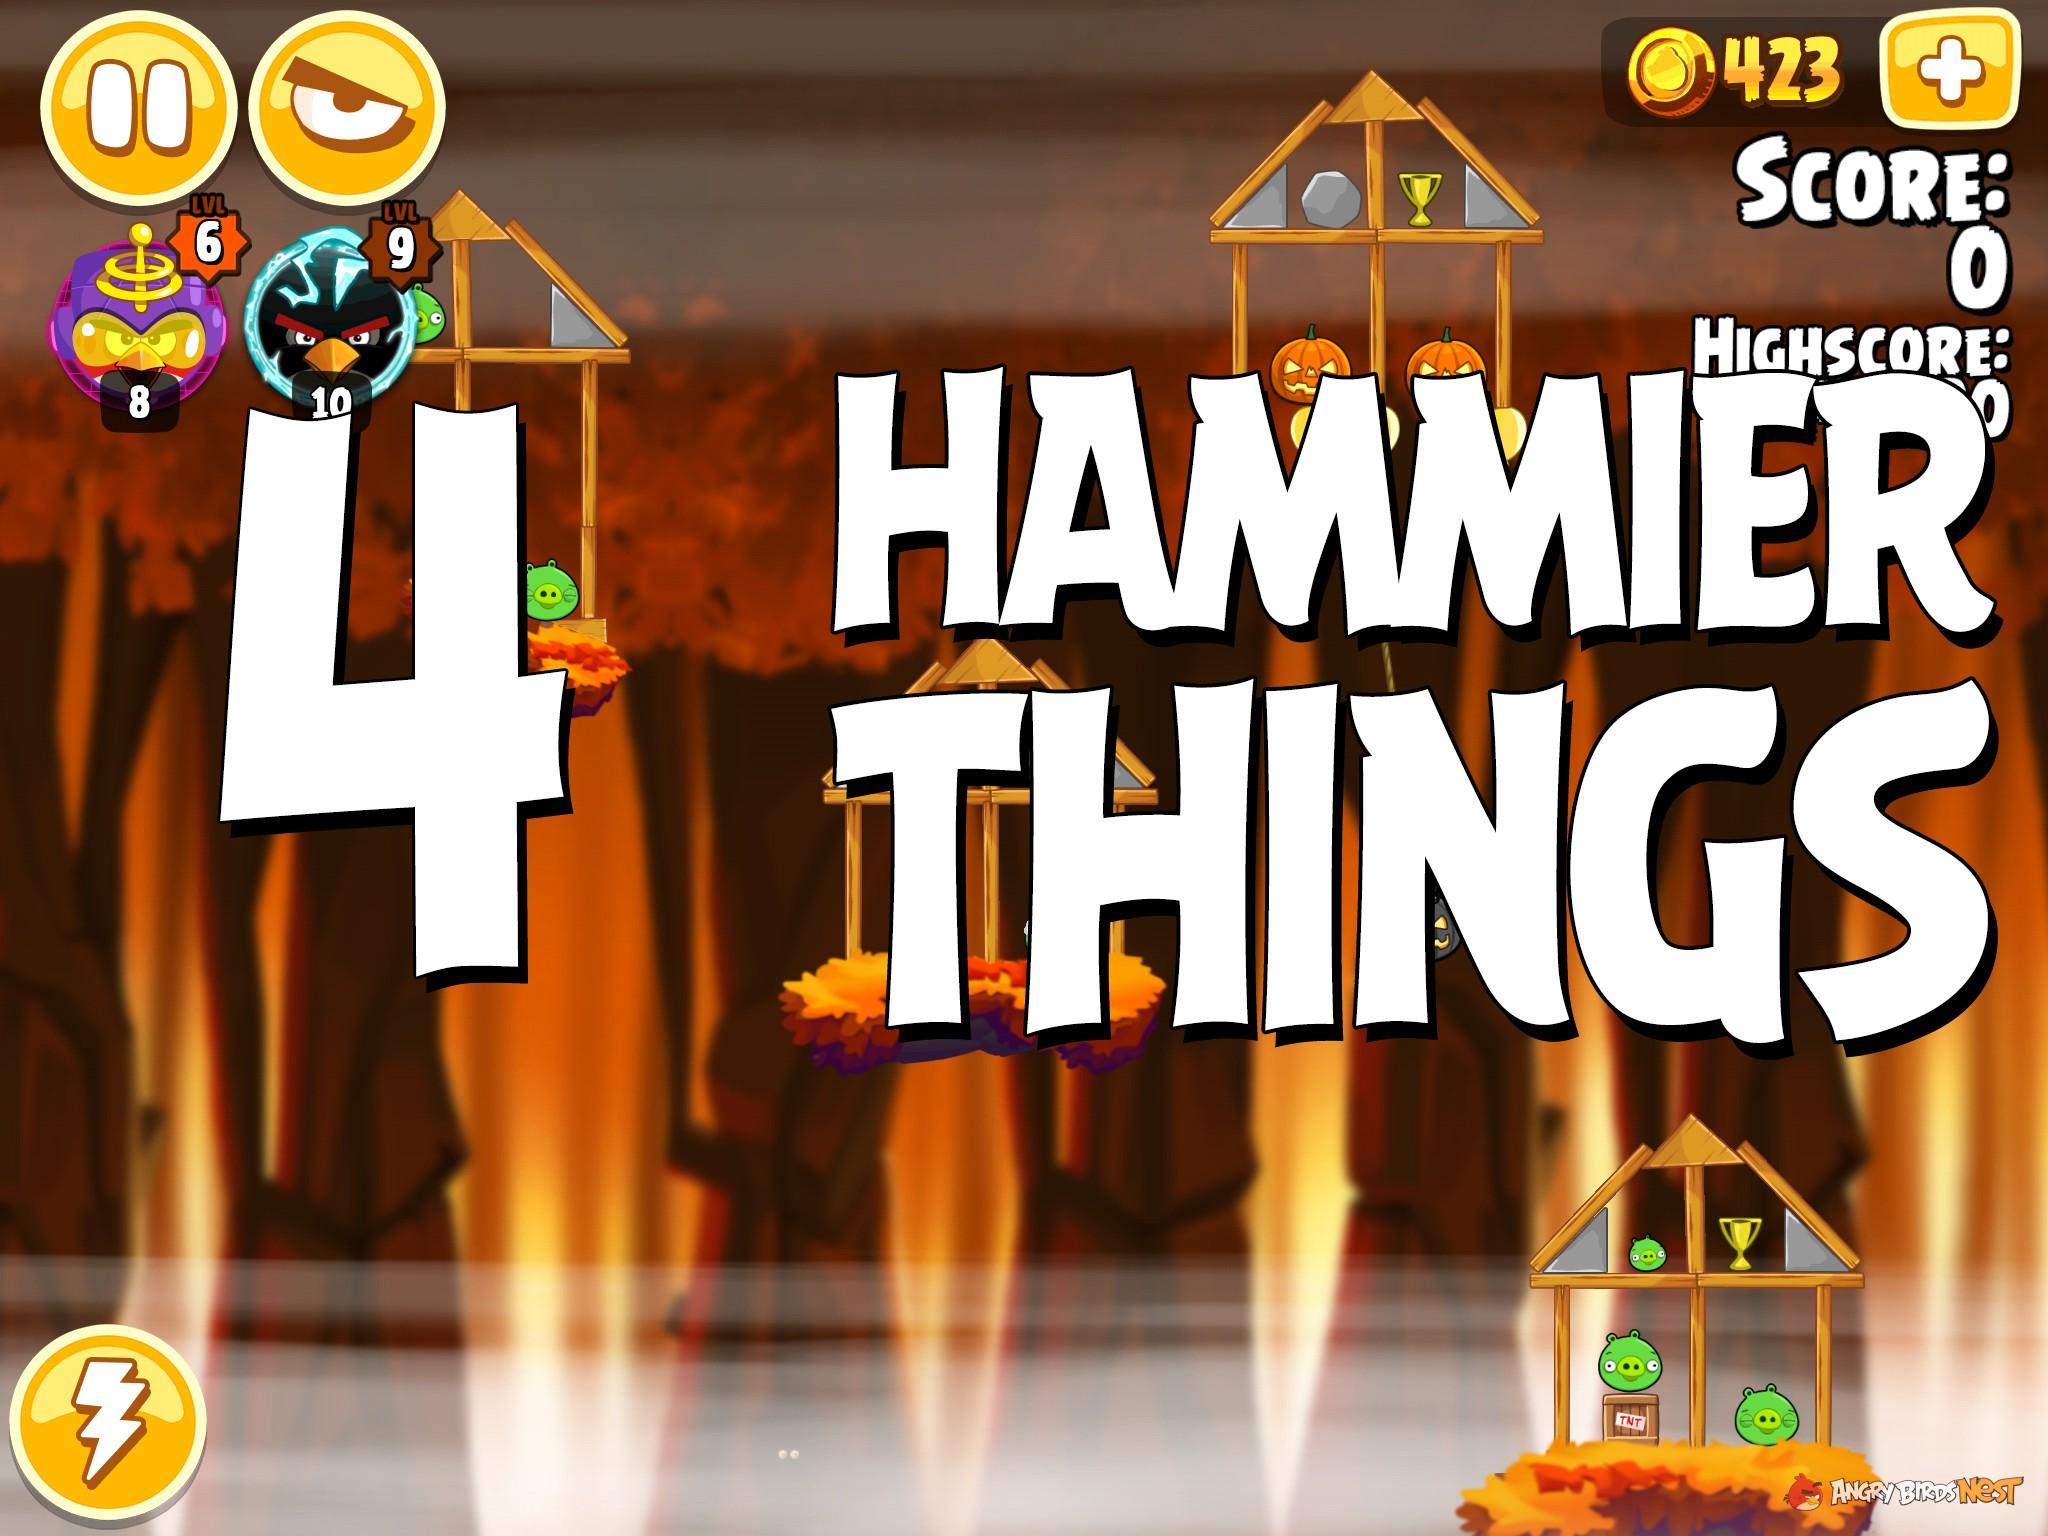 Angry Birds Hammier Things angry birds seasons hammier things level 1-4 walkthrough